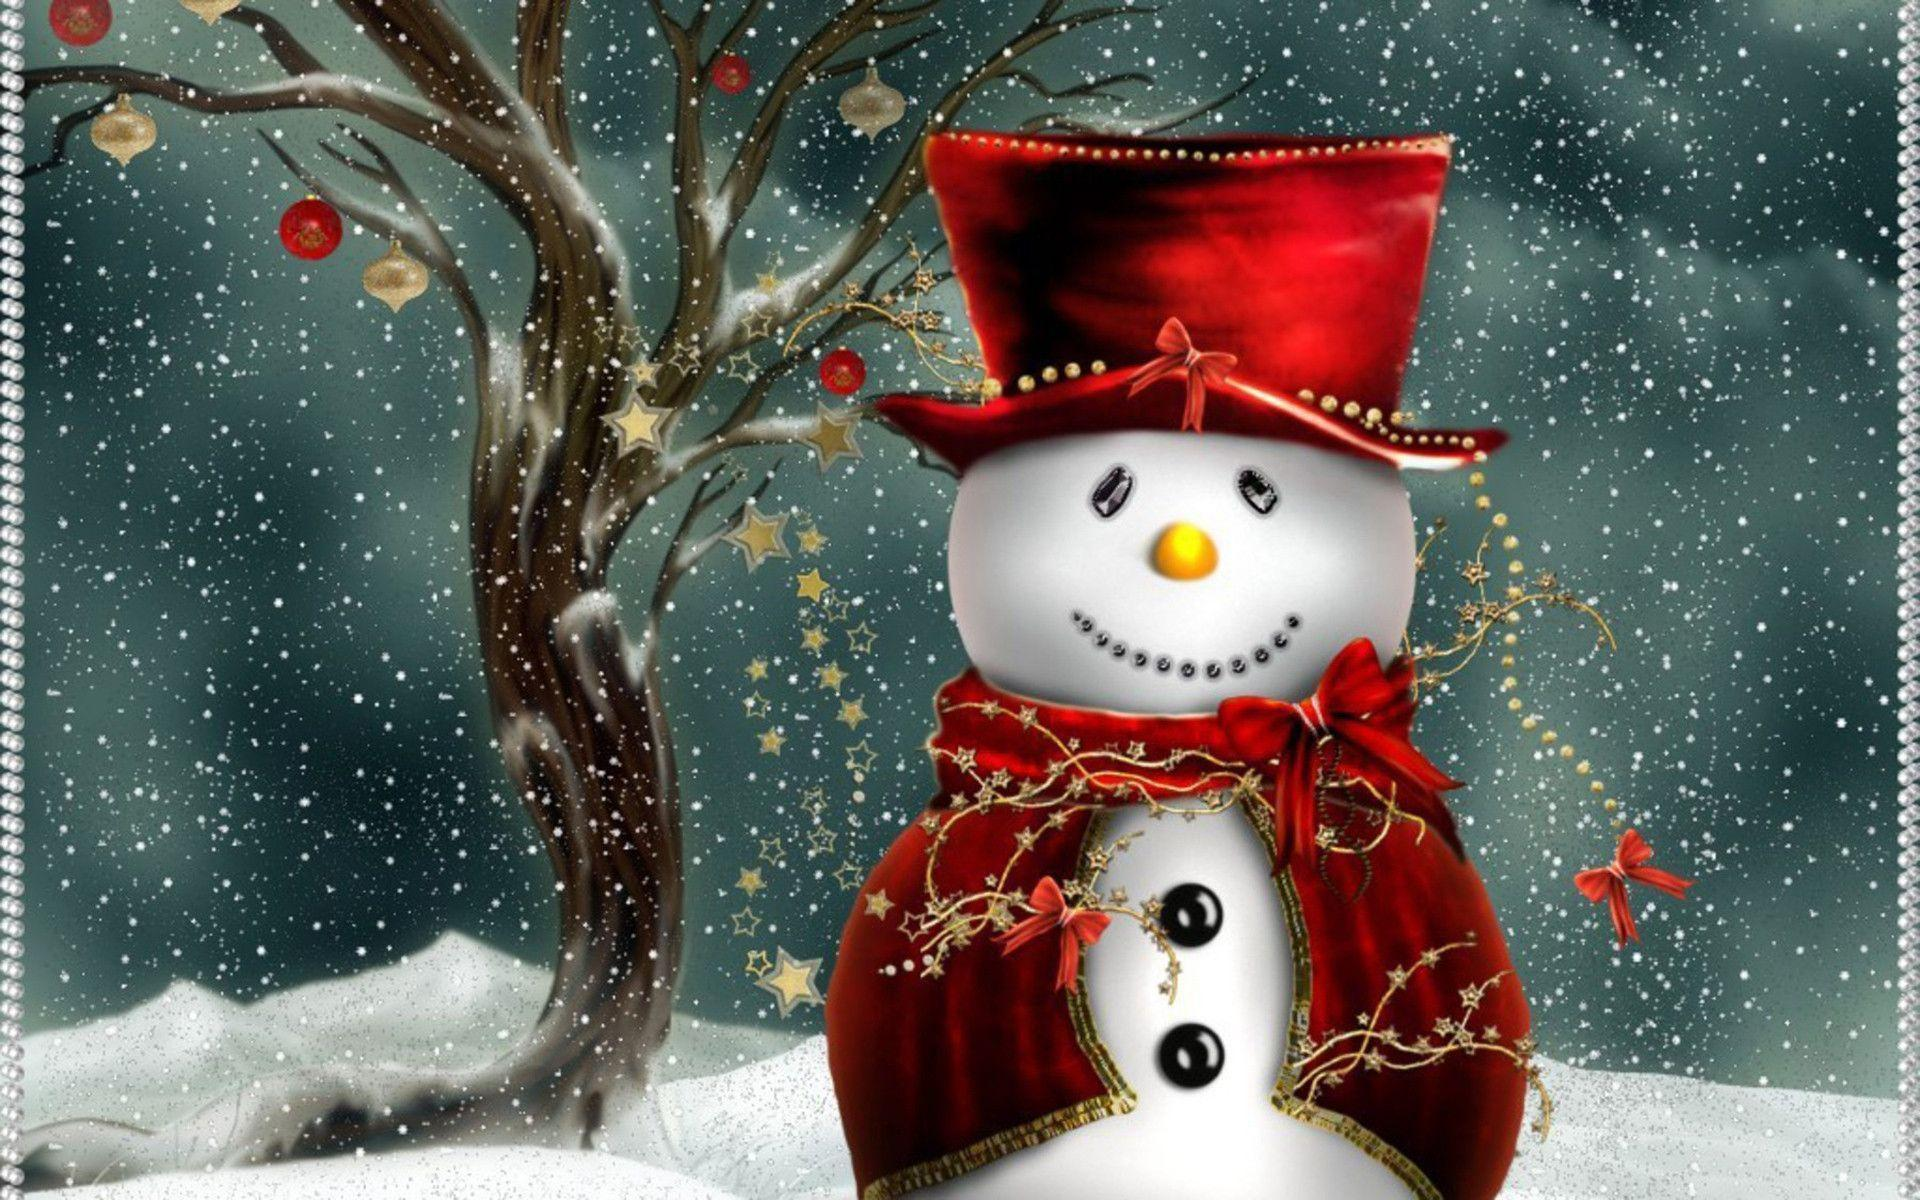 Christmas Desktops Images Posted By John Thompson